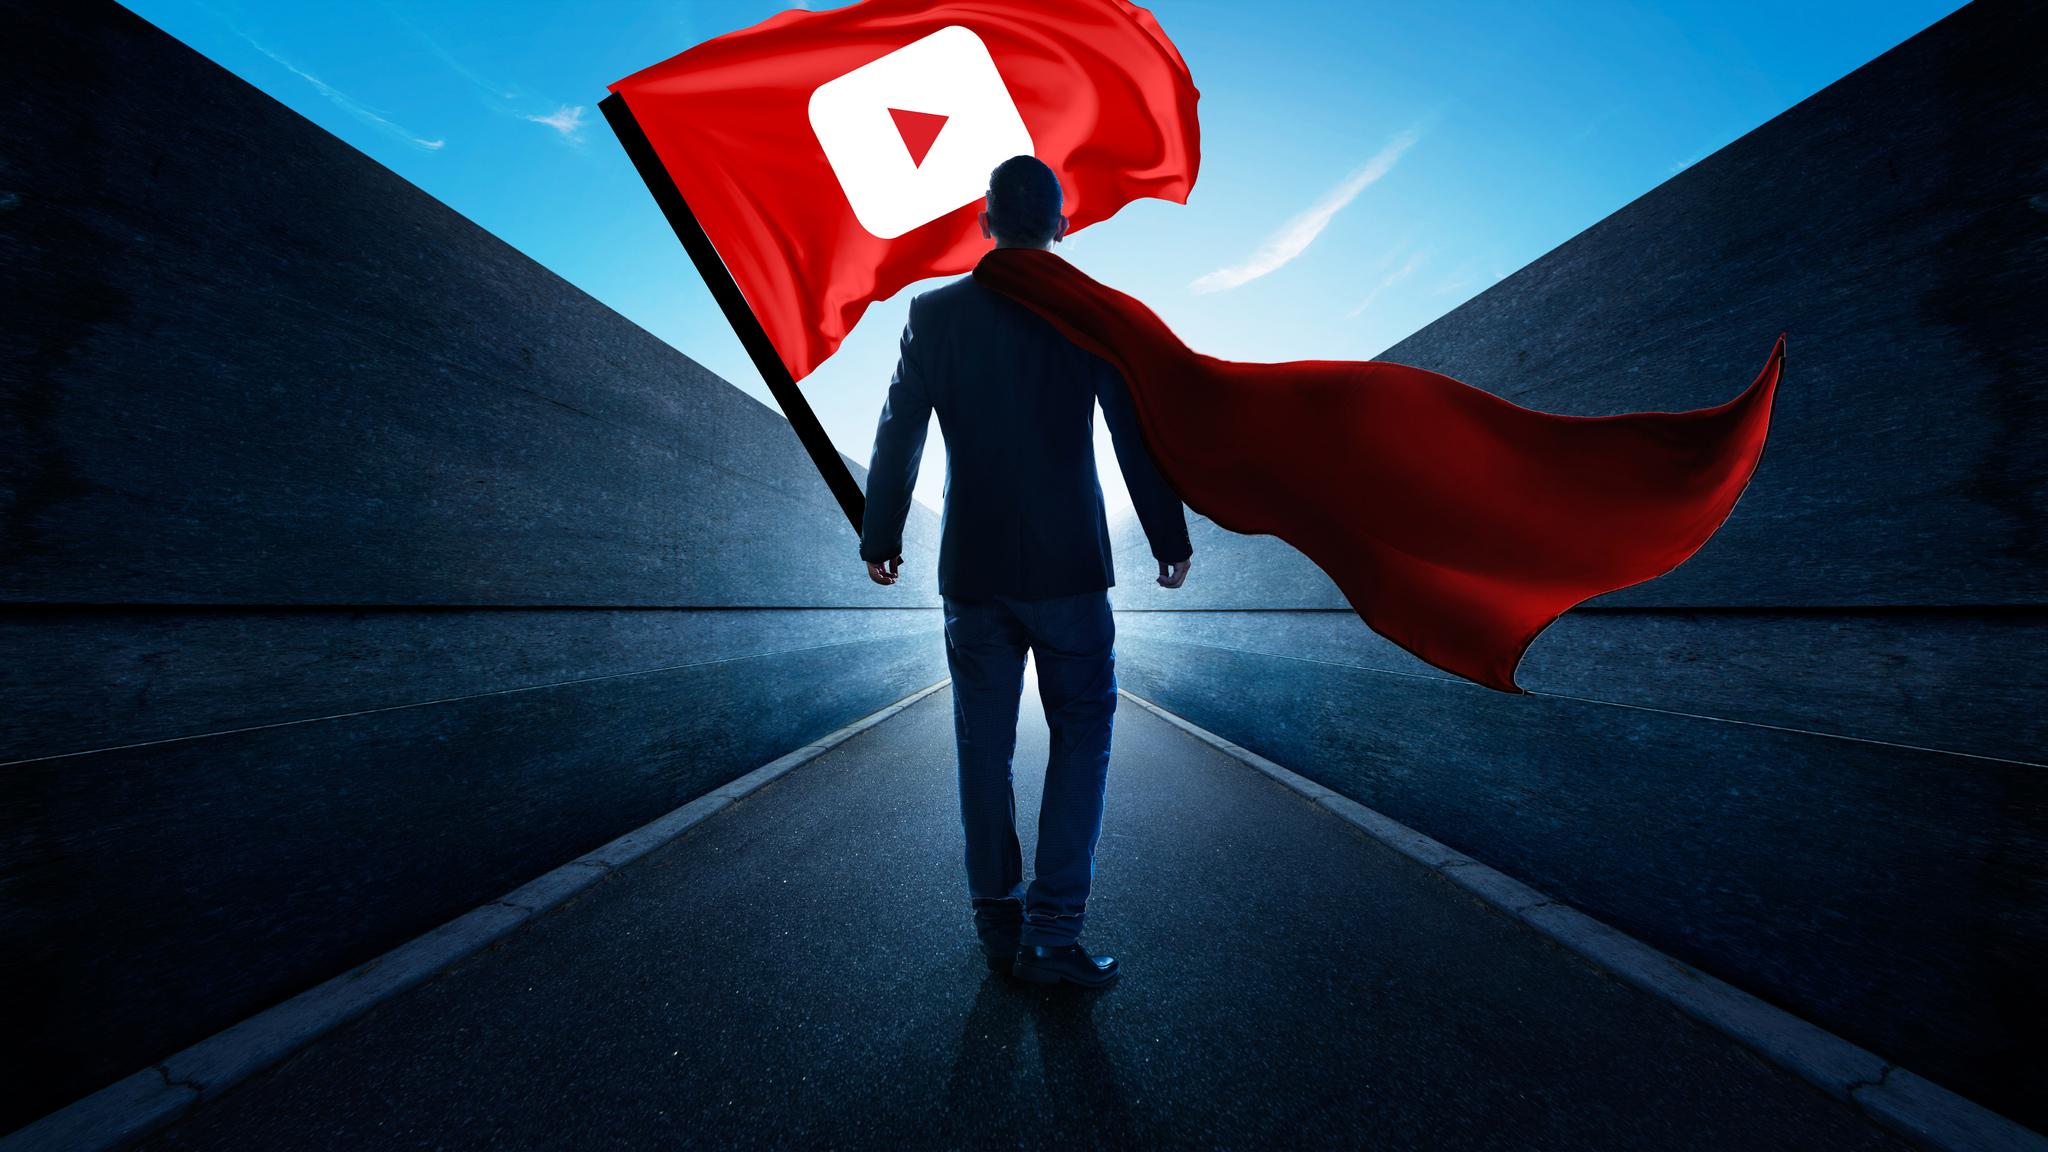 2048x1152 Man With Youtube Flag 2048x1152 Resolution Hd 4k